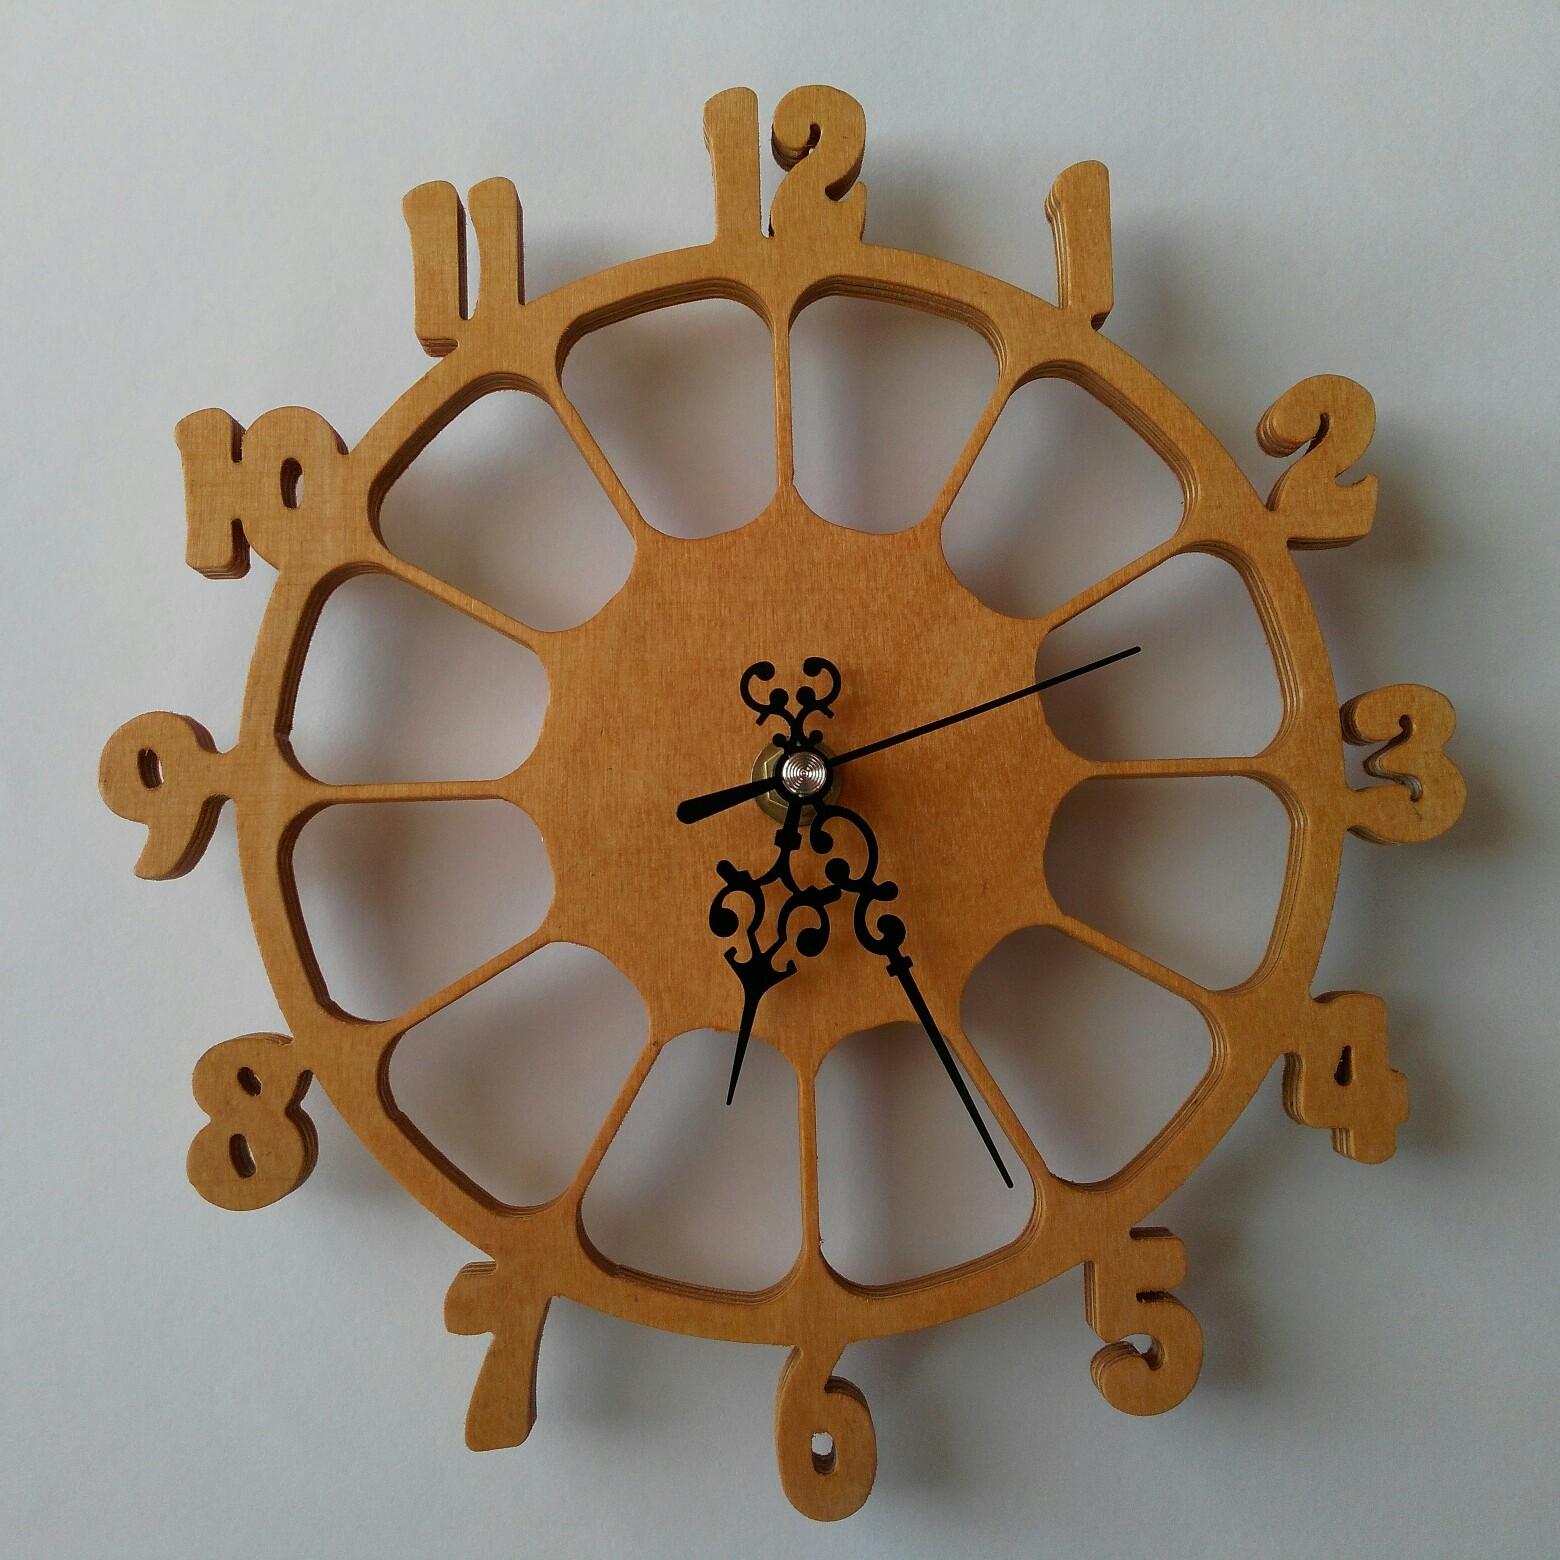 Laser Cut Wall Clock CNC Template DXF File